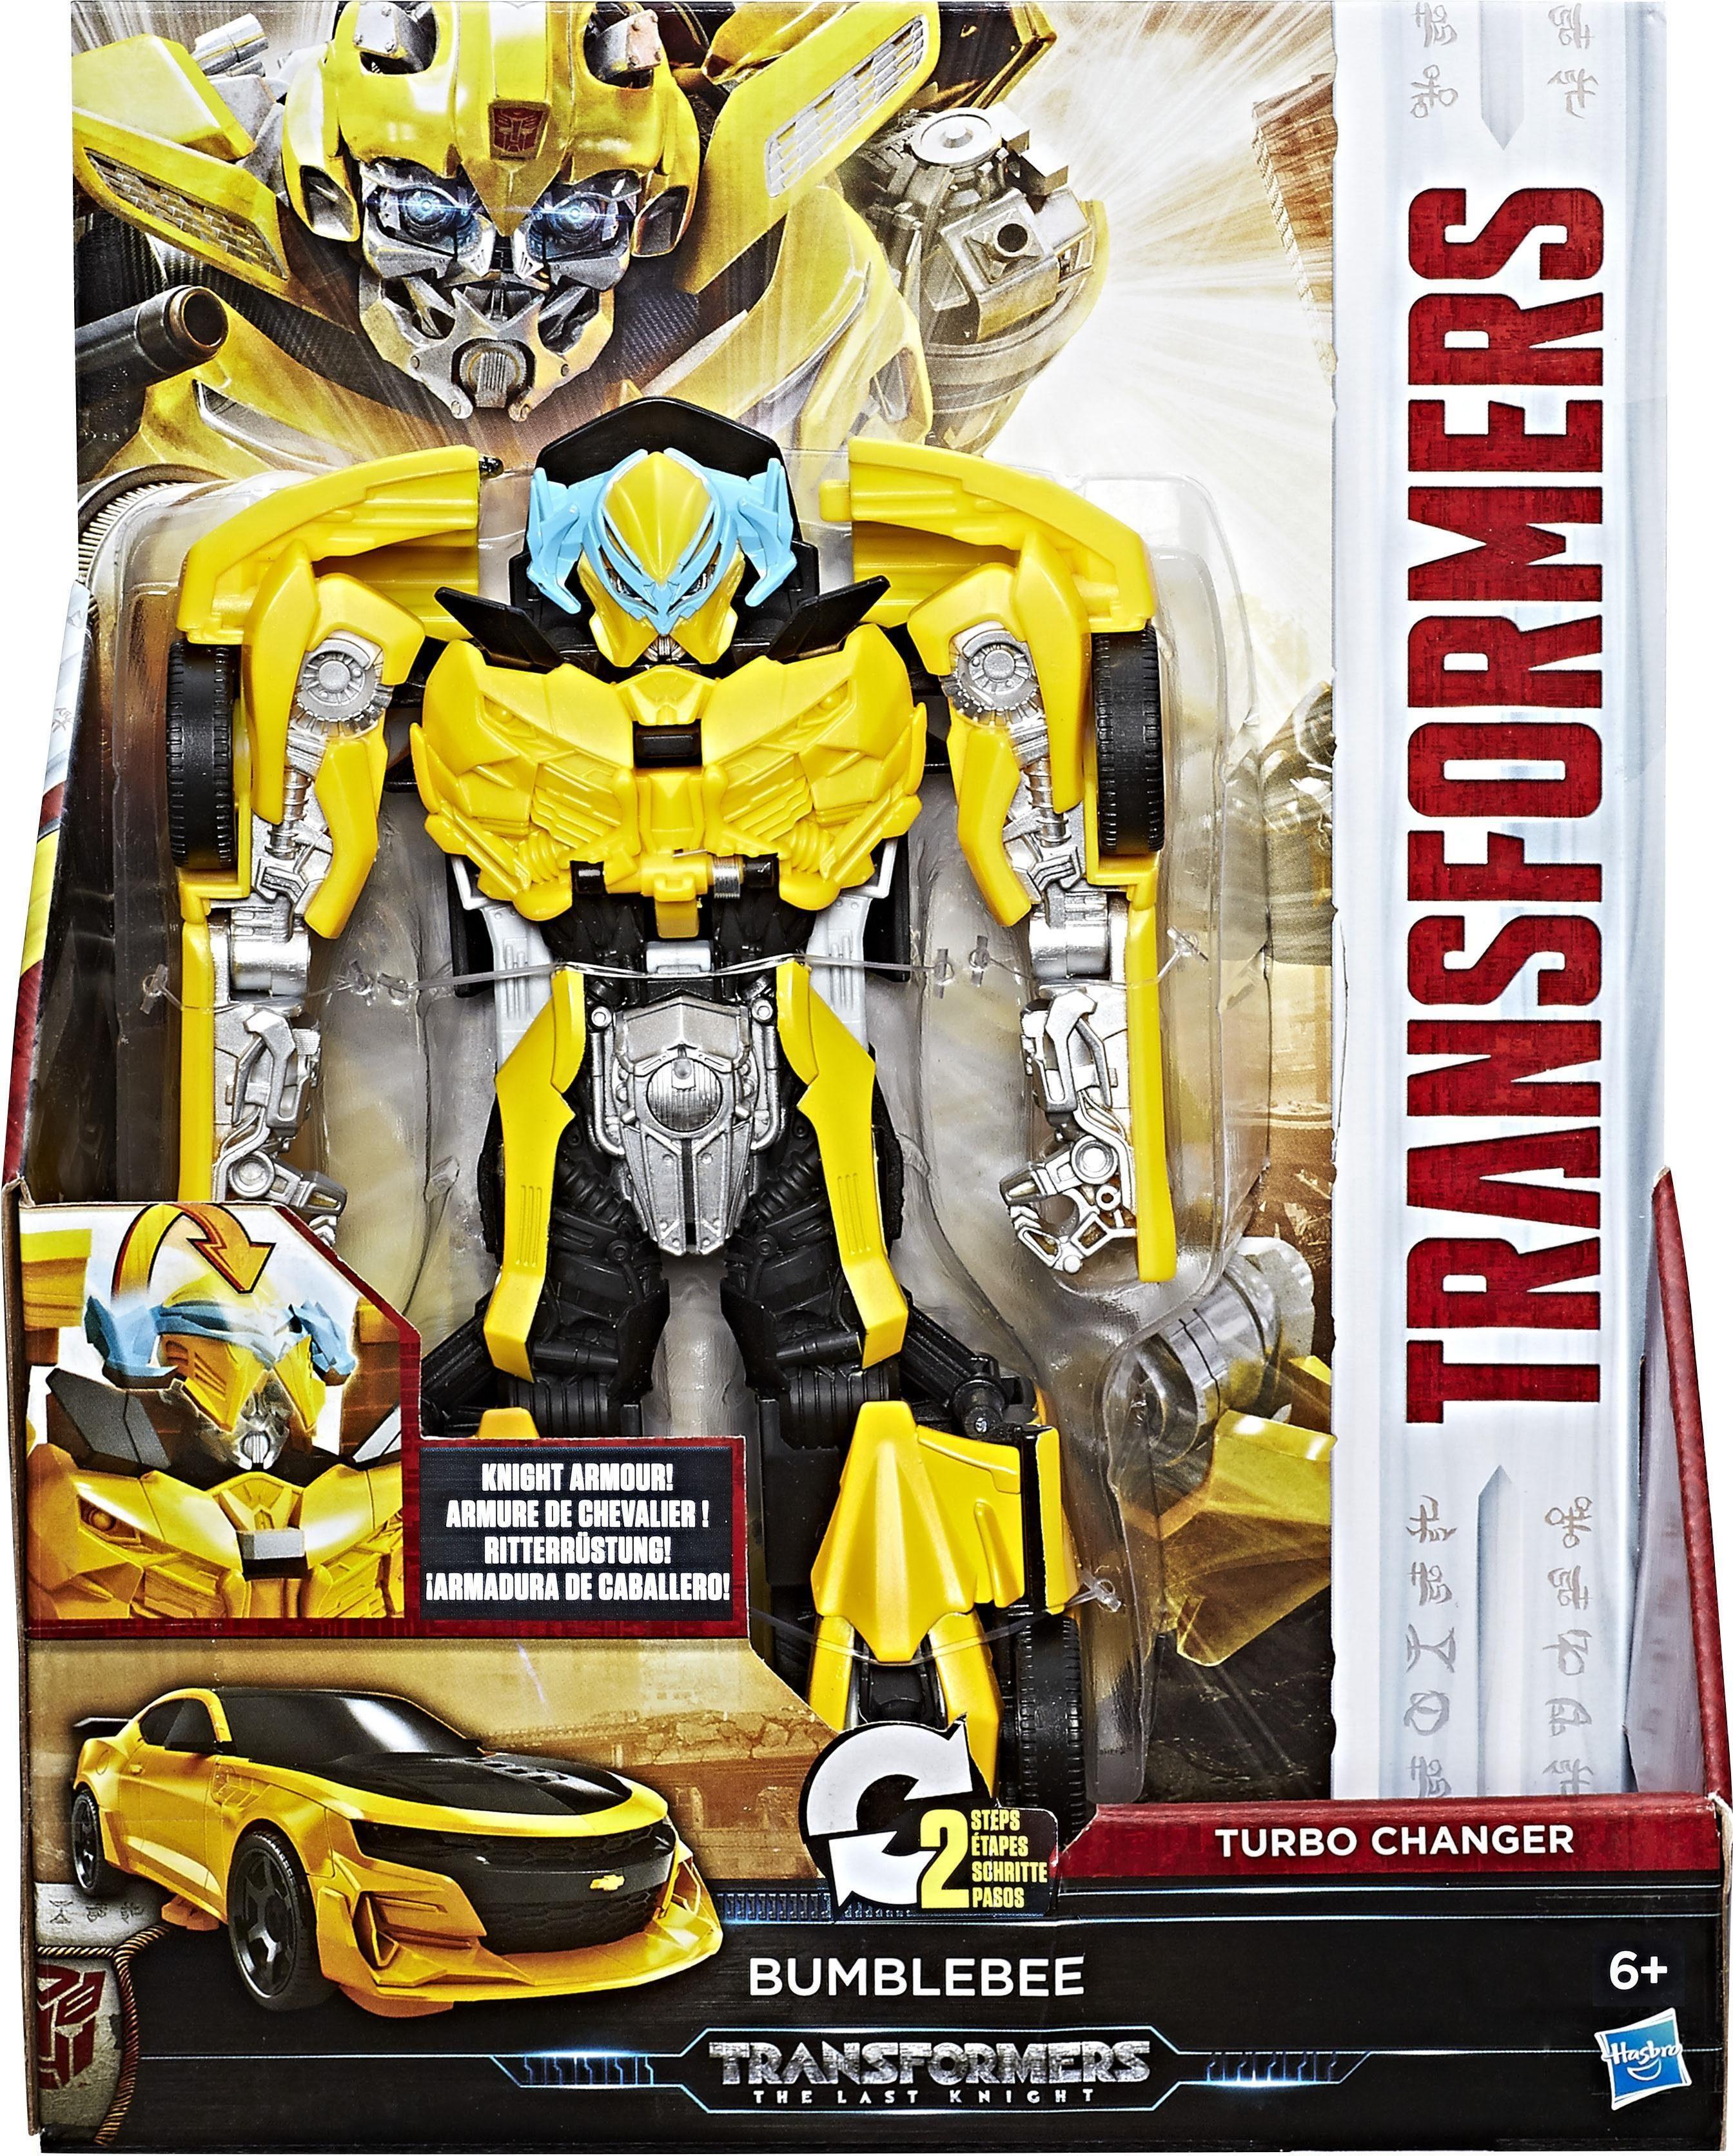 Hasbro Spielfigur, »Transformers 5, KnightArmor Turbo Changer Bumblebee«